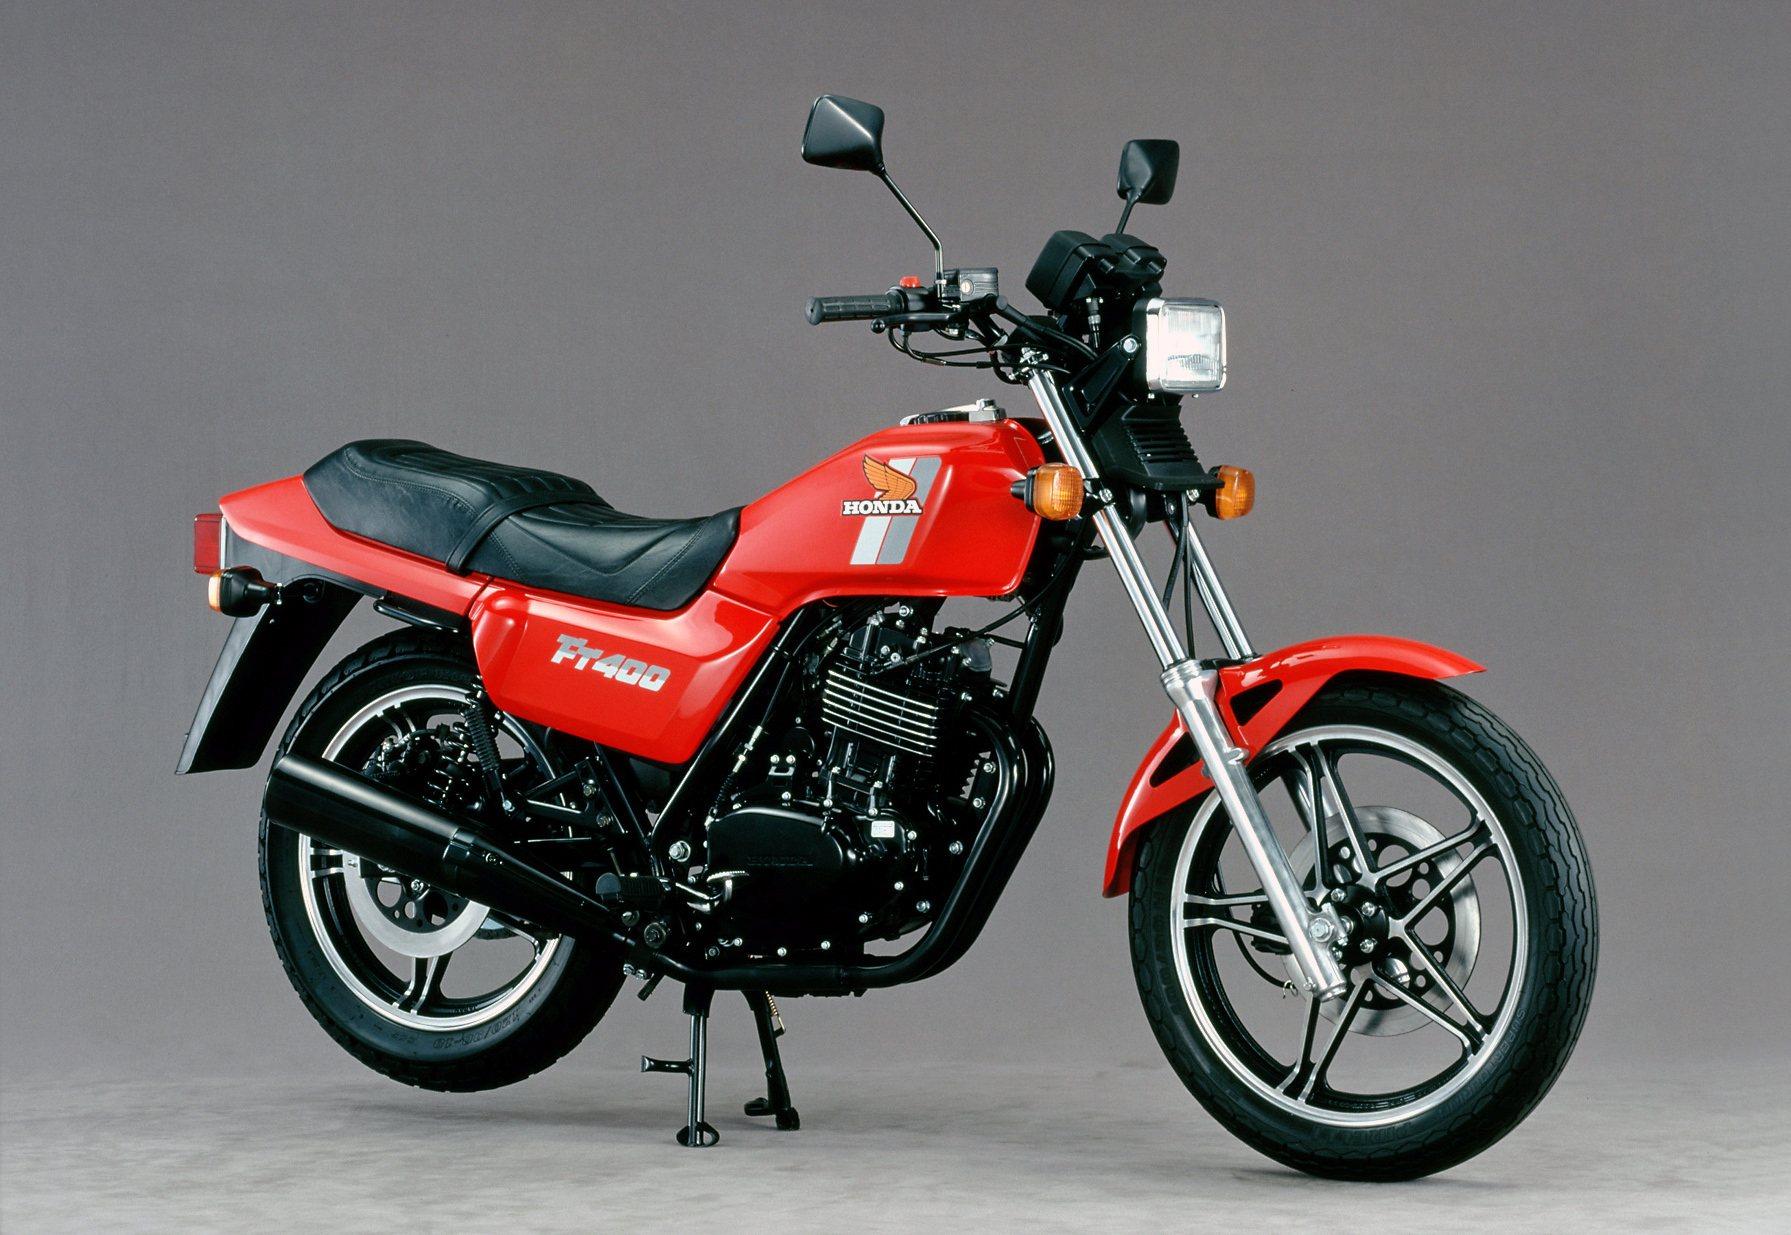 Moto del día: Honda FT 400